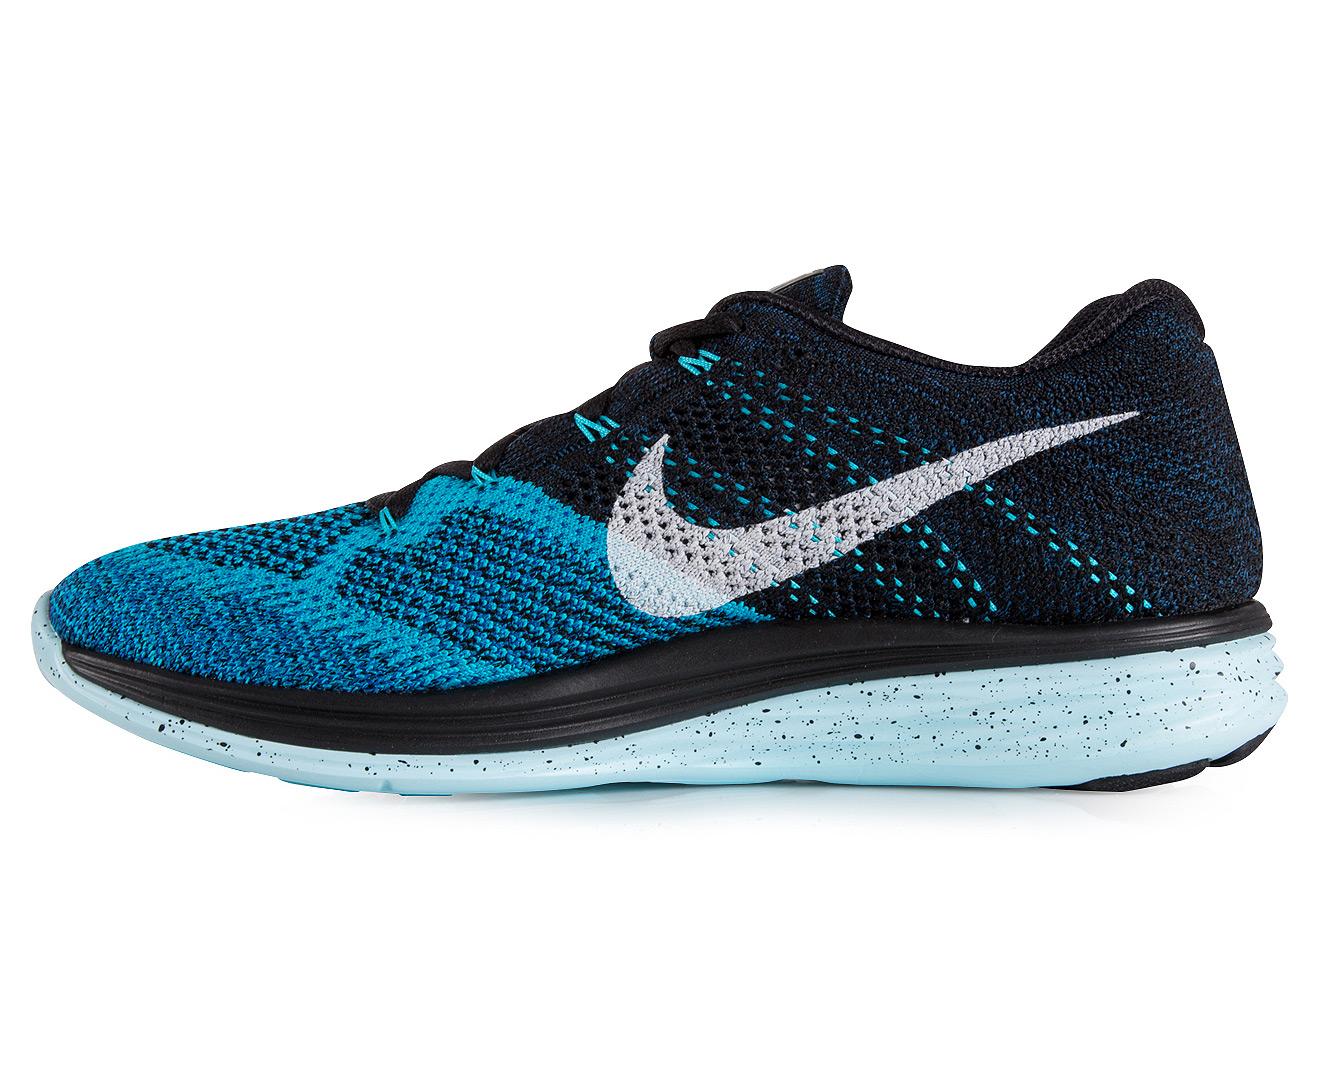 promo code 6e46f ce18a Nike Flyknit Lunar 3 Shoe - Black White-Blue Lagoon Blue   Catch.com.au